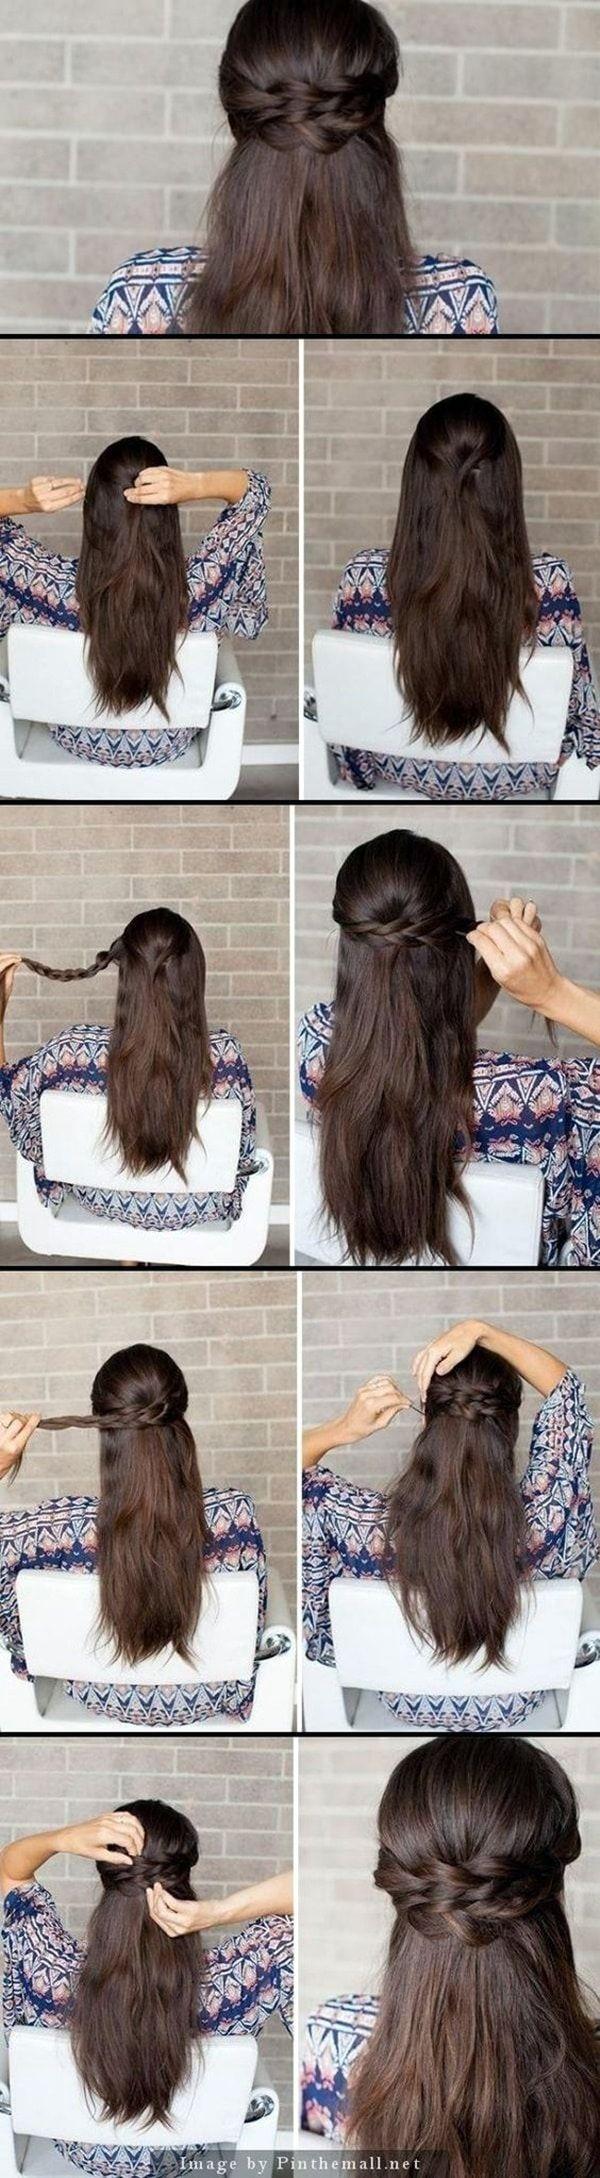 Quickhairstyletutorialsforofficewomen hairstyle